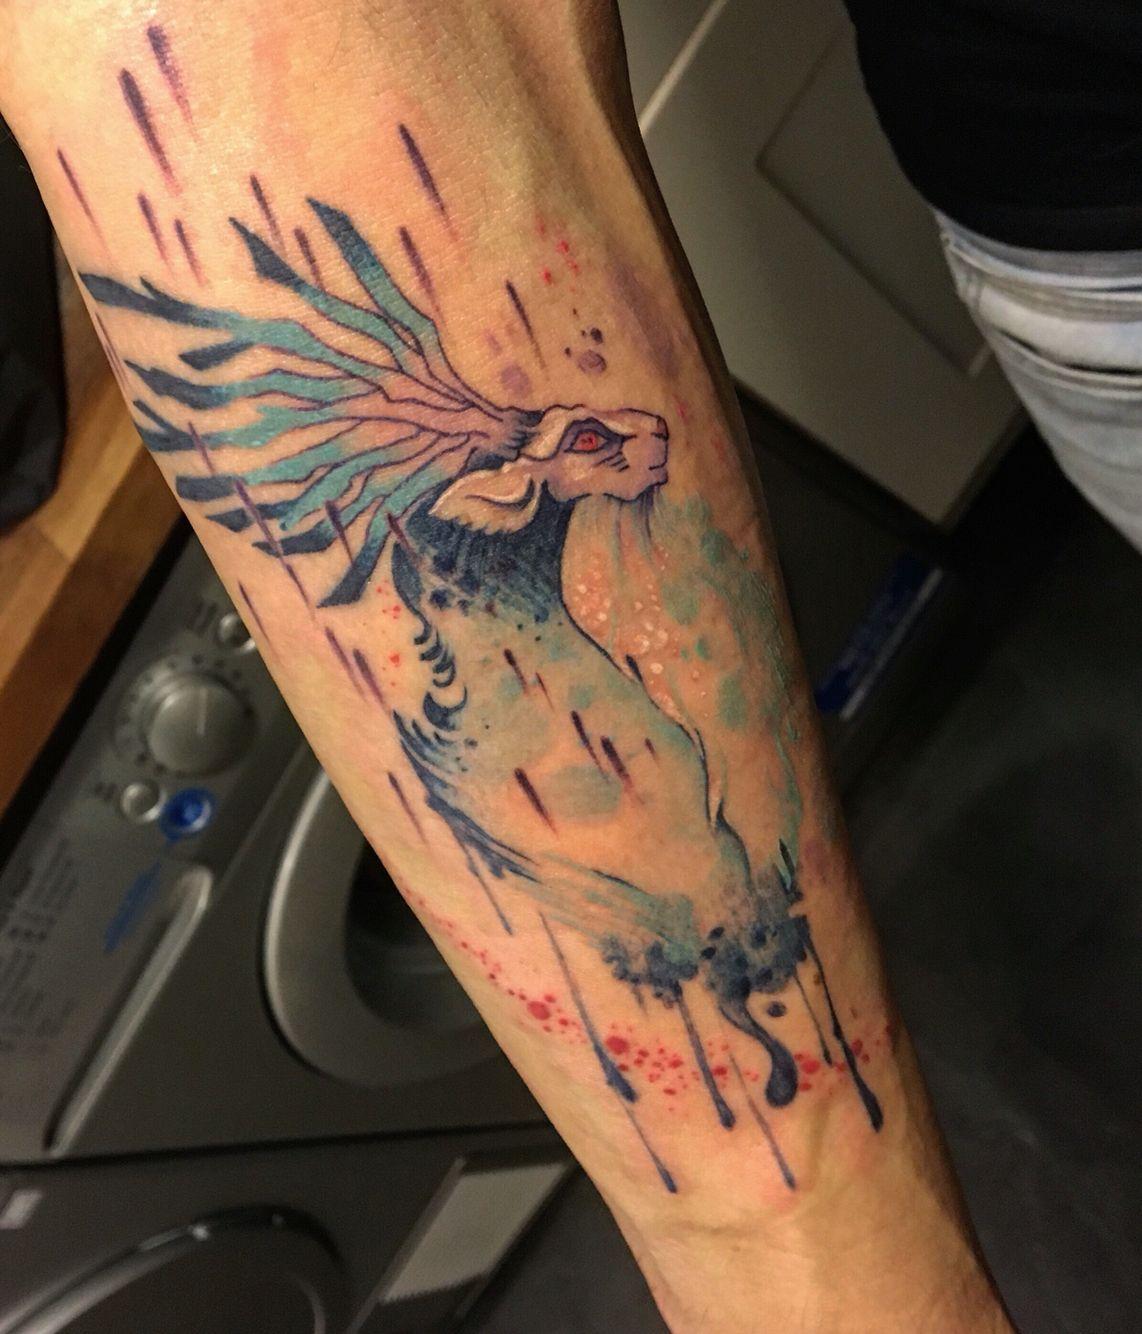 princes mononoke tattoo - Google Search   Inked ...   Princess Mononoke Tattoo Design